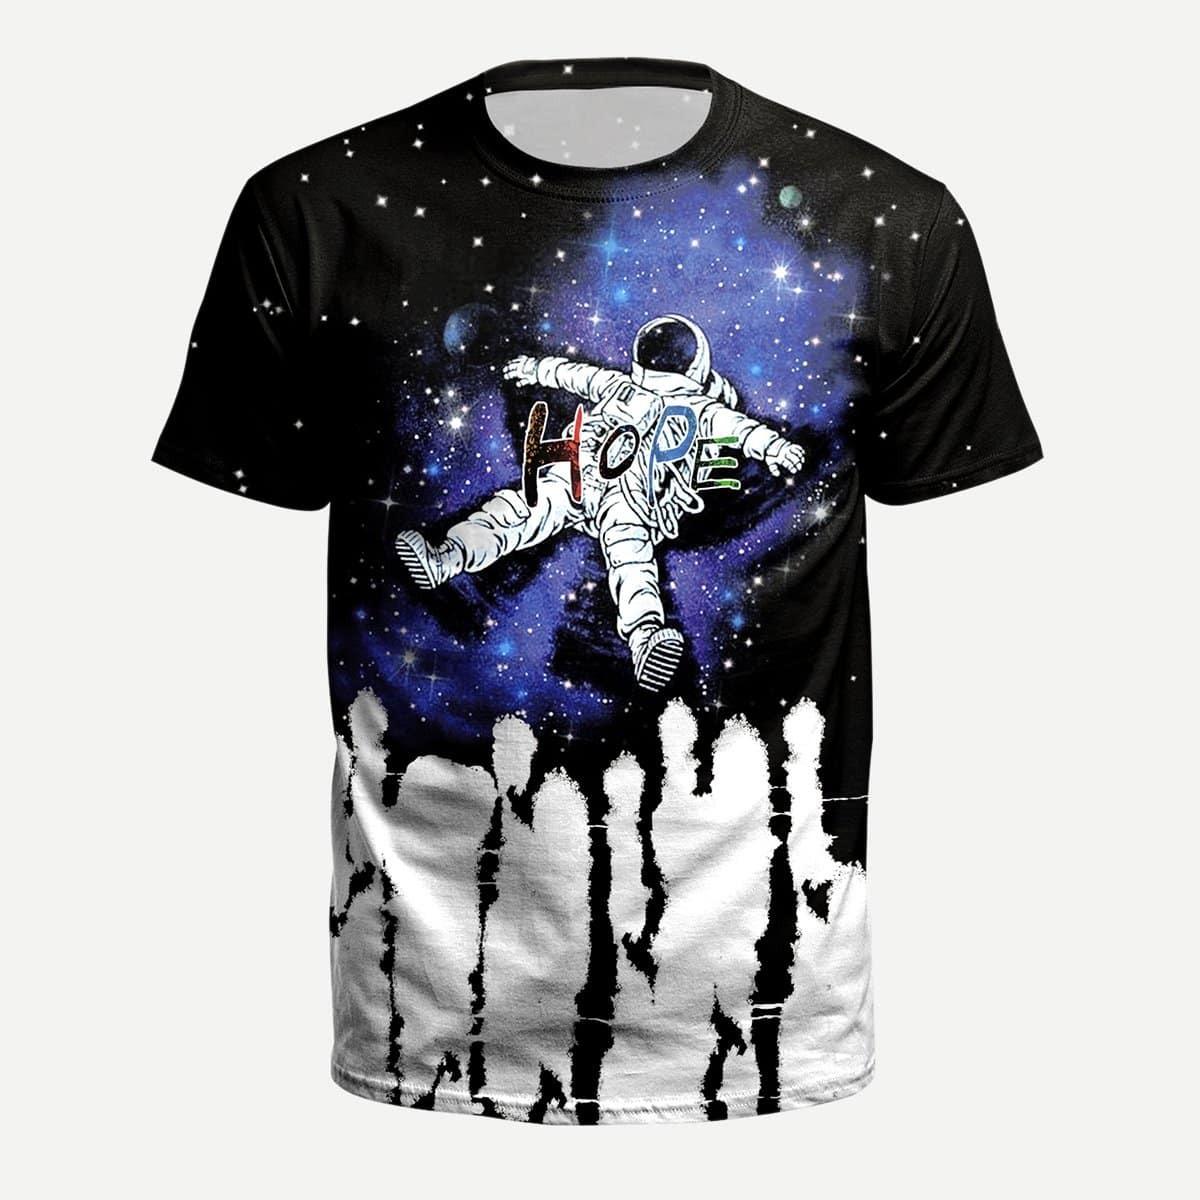 Astronaut Print Tee